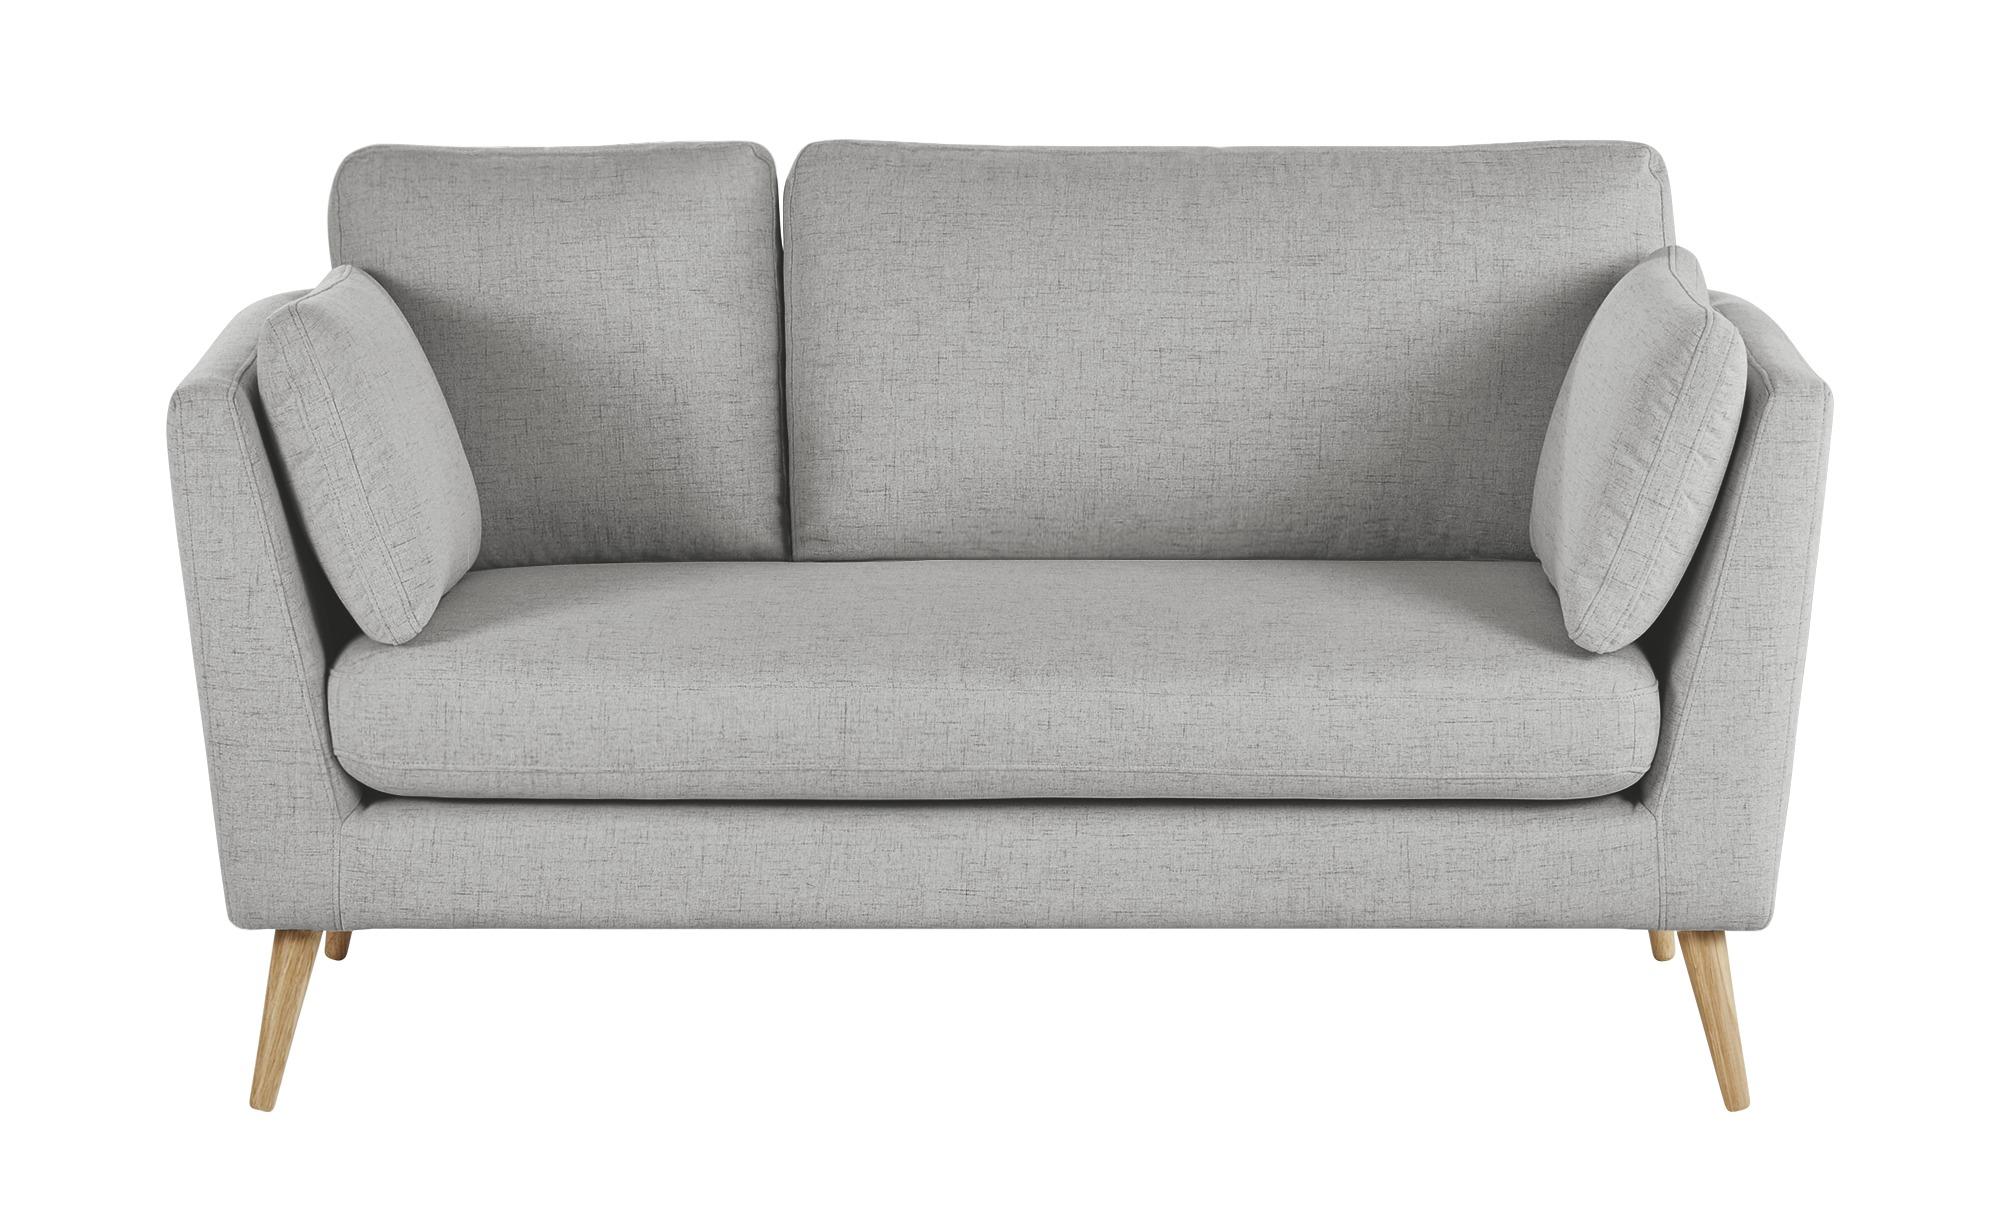 finya Skandi-Sofa grau - Webstoff Jane ¦ grau ¦ Maße (cm): B: 162 H: 92 T: 88 Polstermöbel > Sofas > 2-Sitzer - Höffner